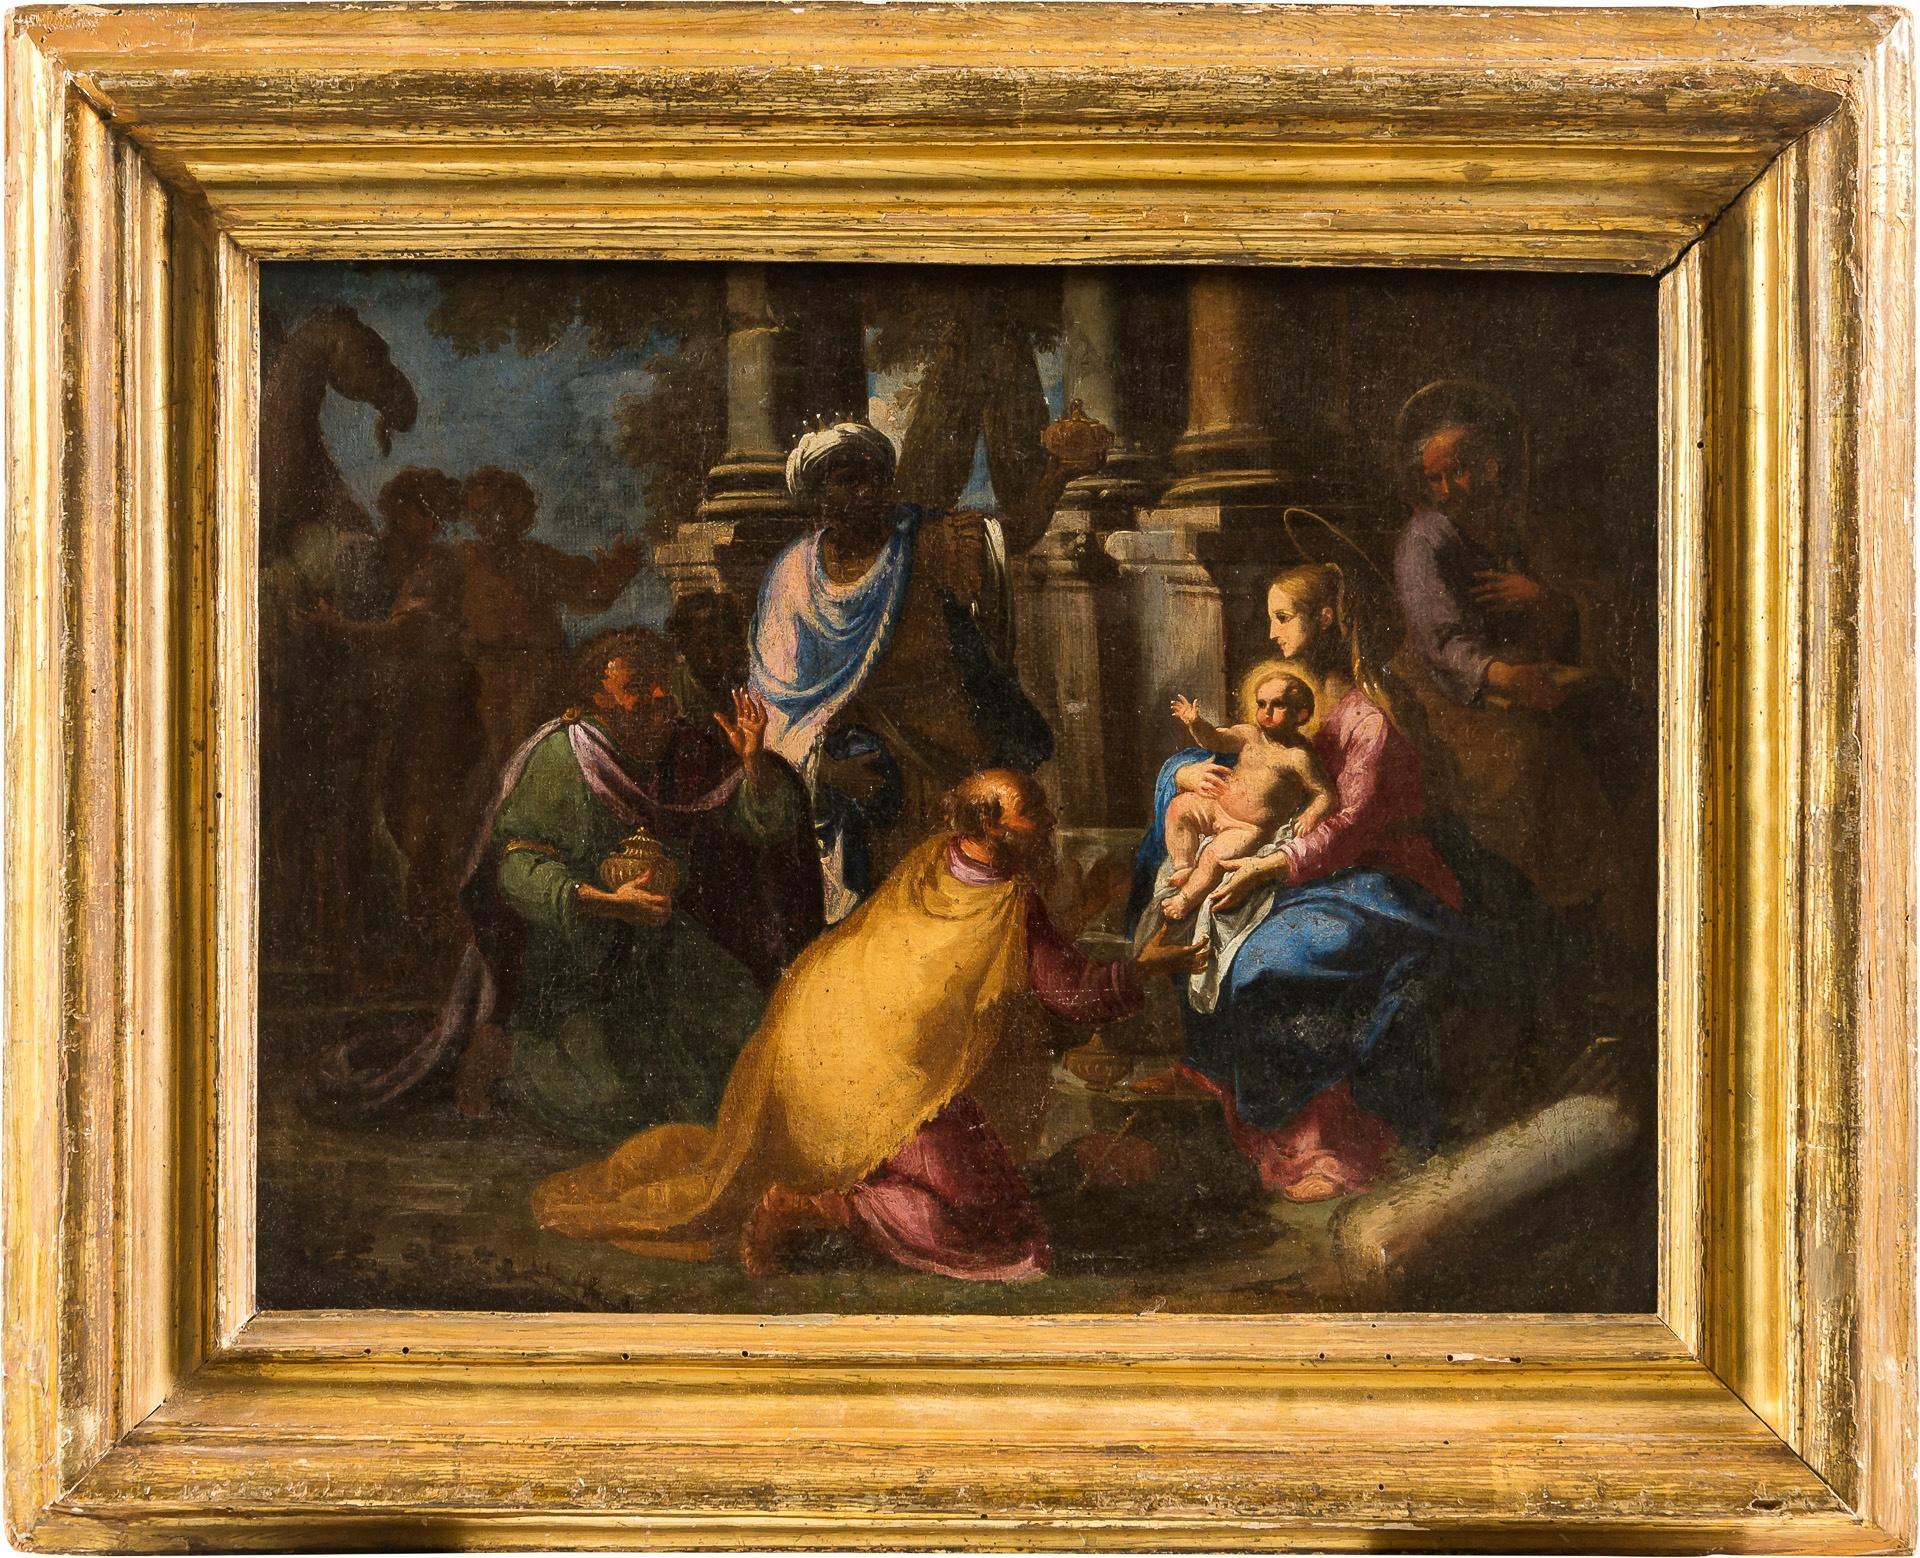 17th century Italian figurative painting - Adoration Magi - Oil on canvas figure